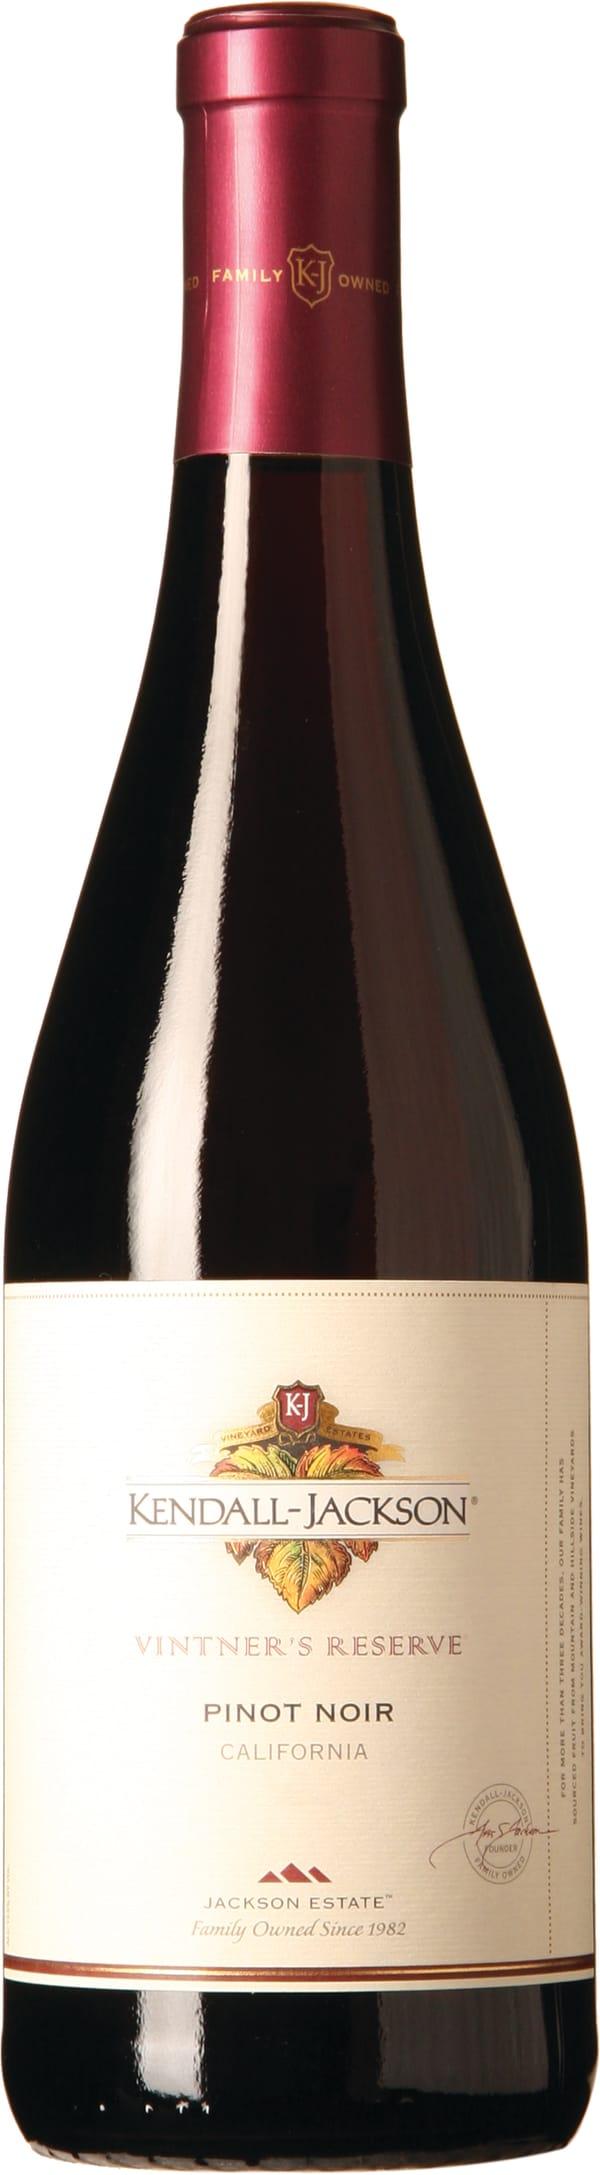 Kendall Jackson Vintners Reserve Pinot Noir 2014